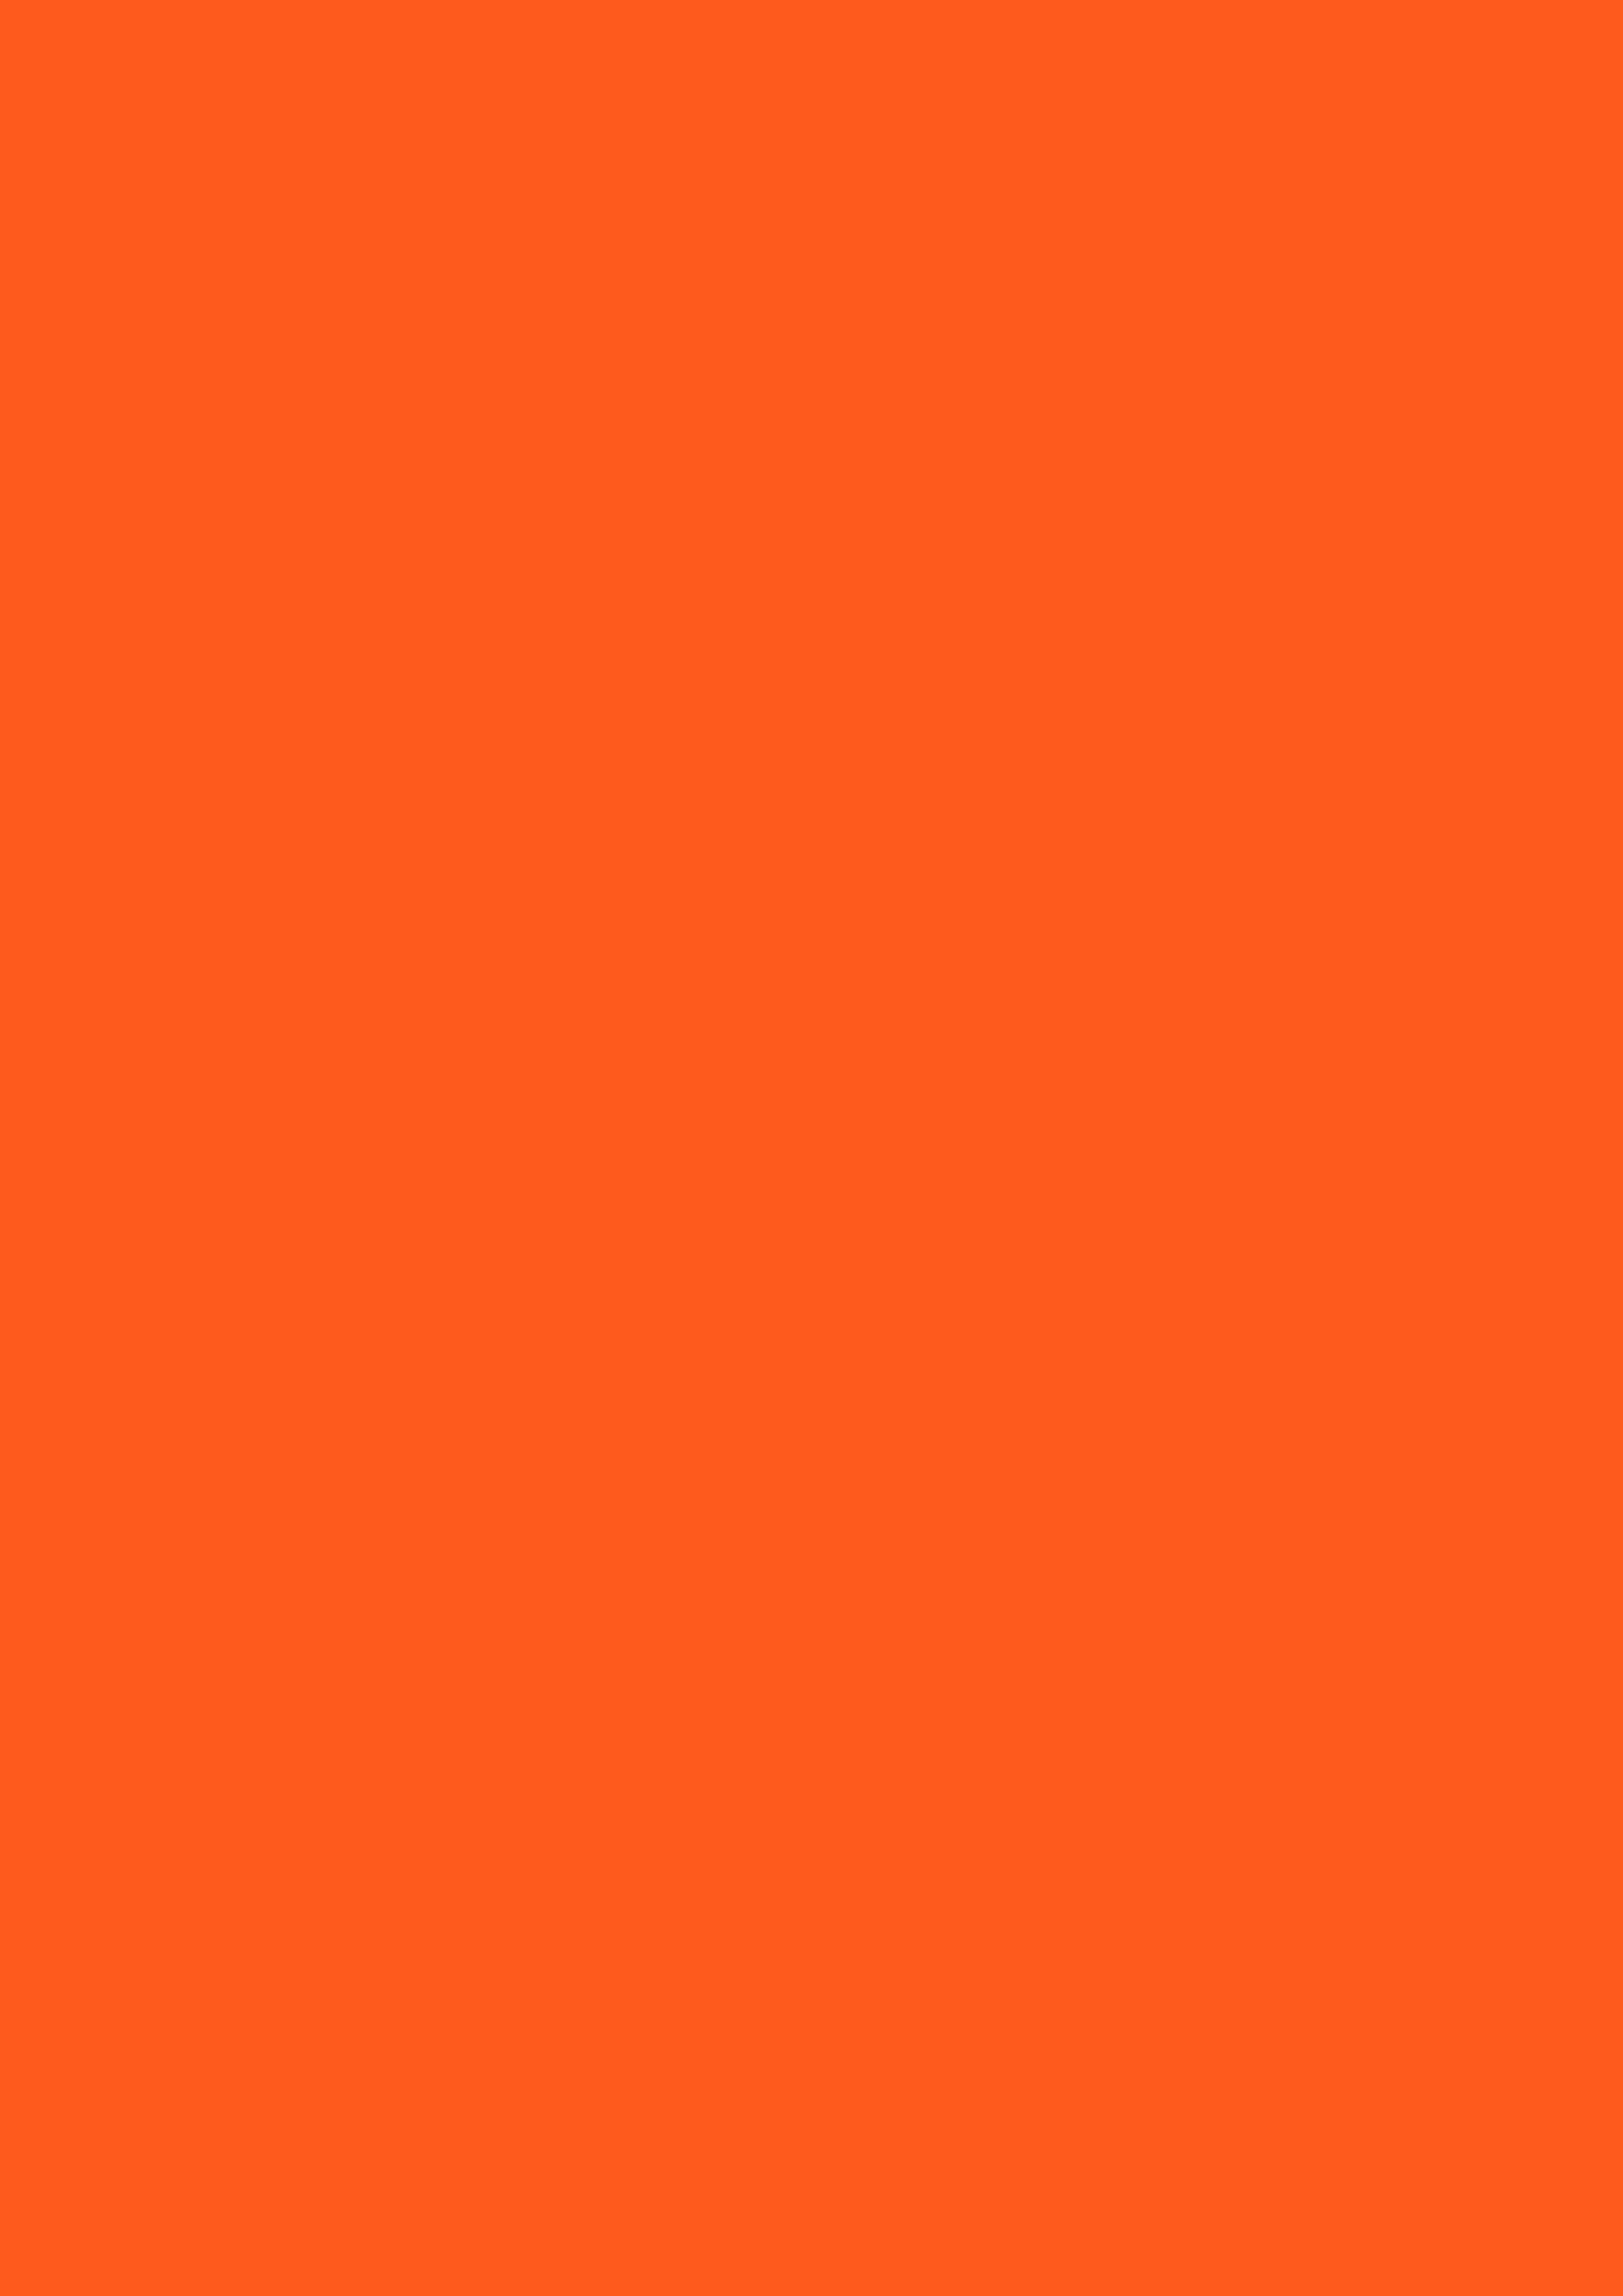 2480x3508 Giants Orange Solid Color Background